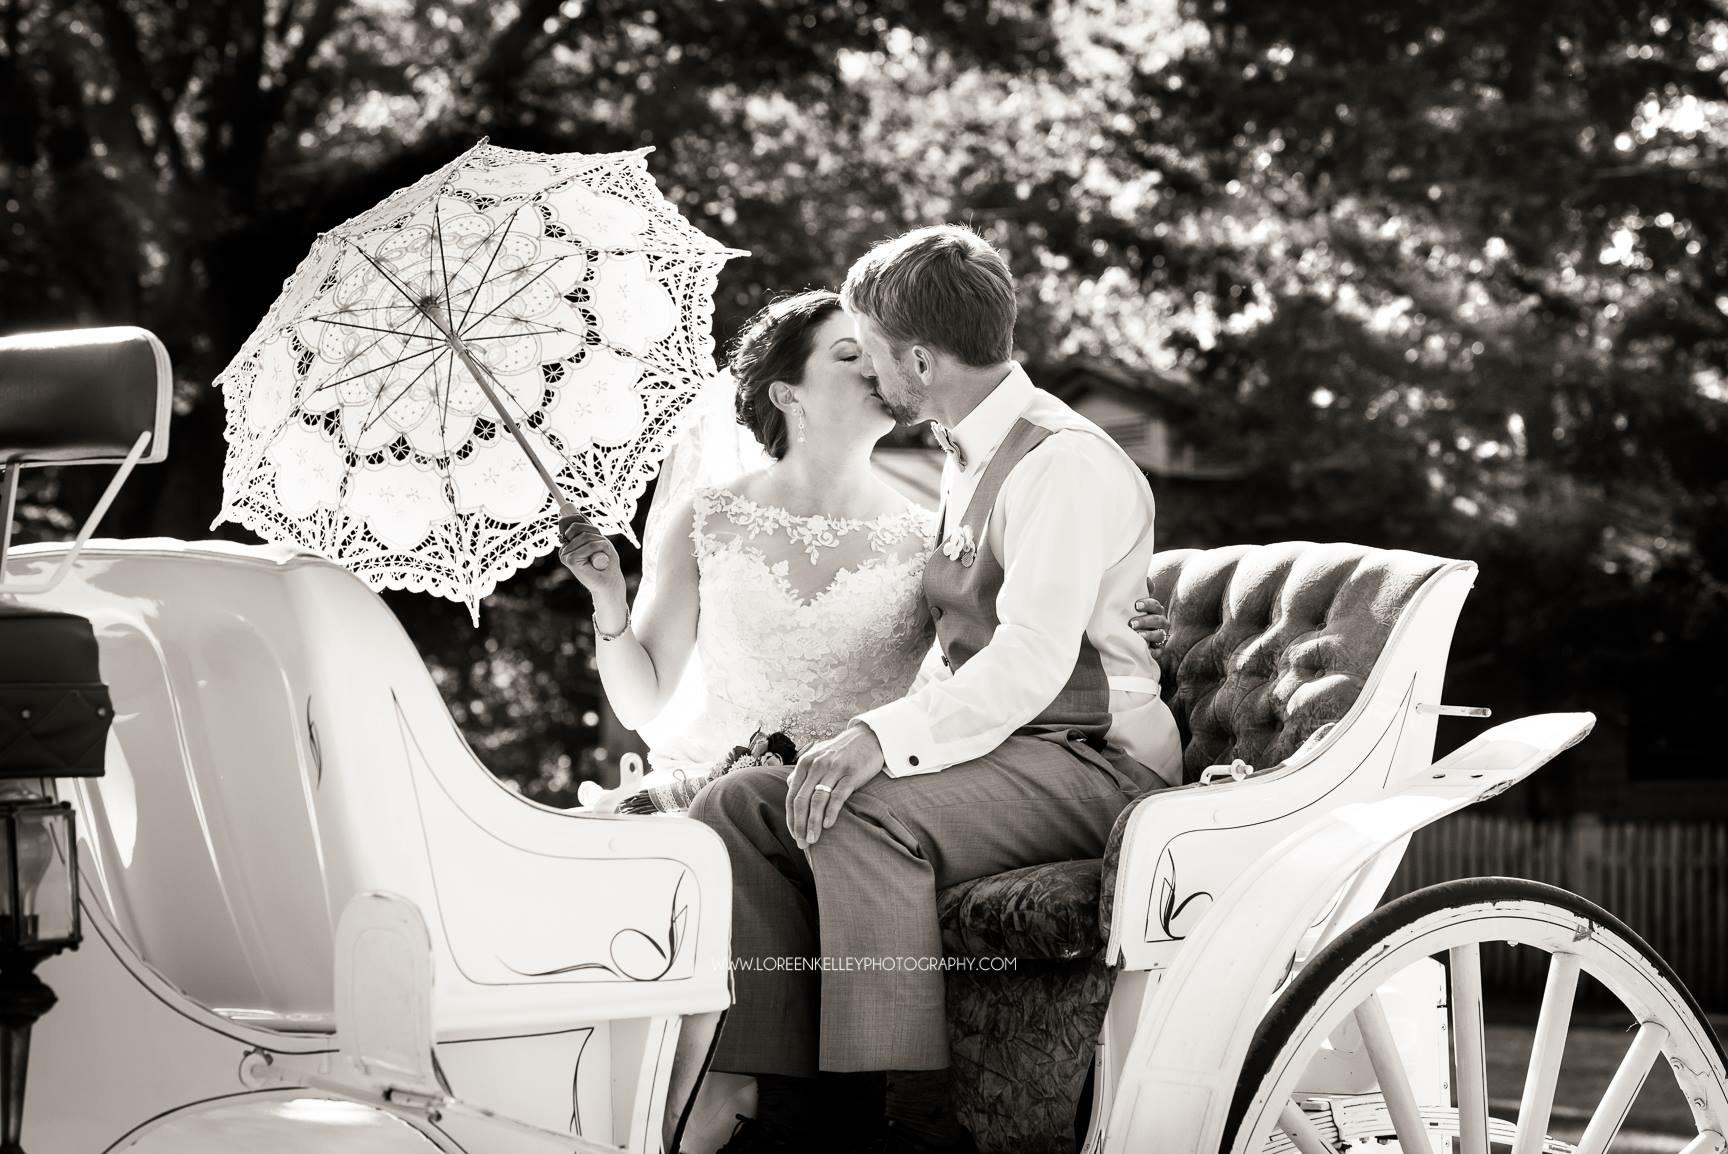 Carriage Ride Wedding Romance Vermont VT